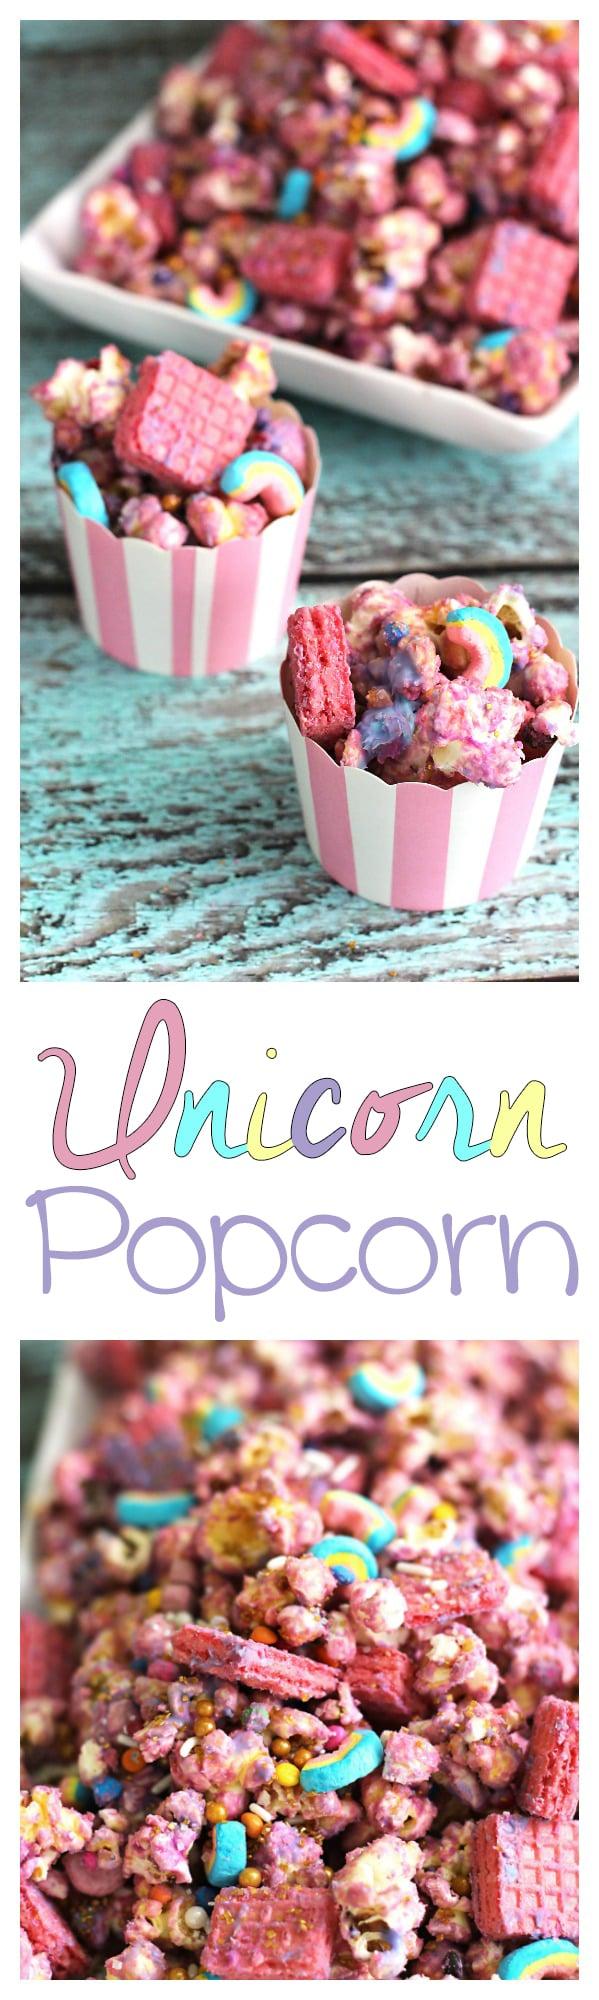 Popcorn Party Cake Recipe